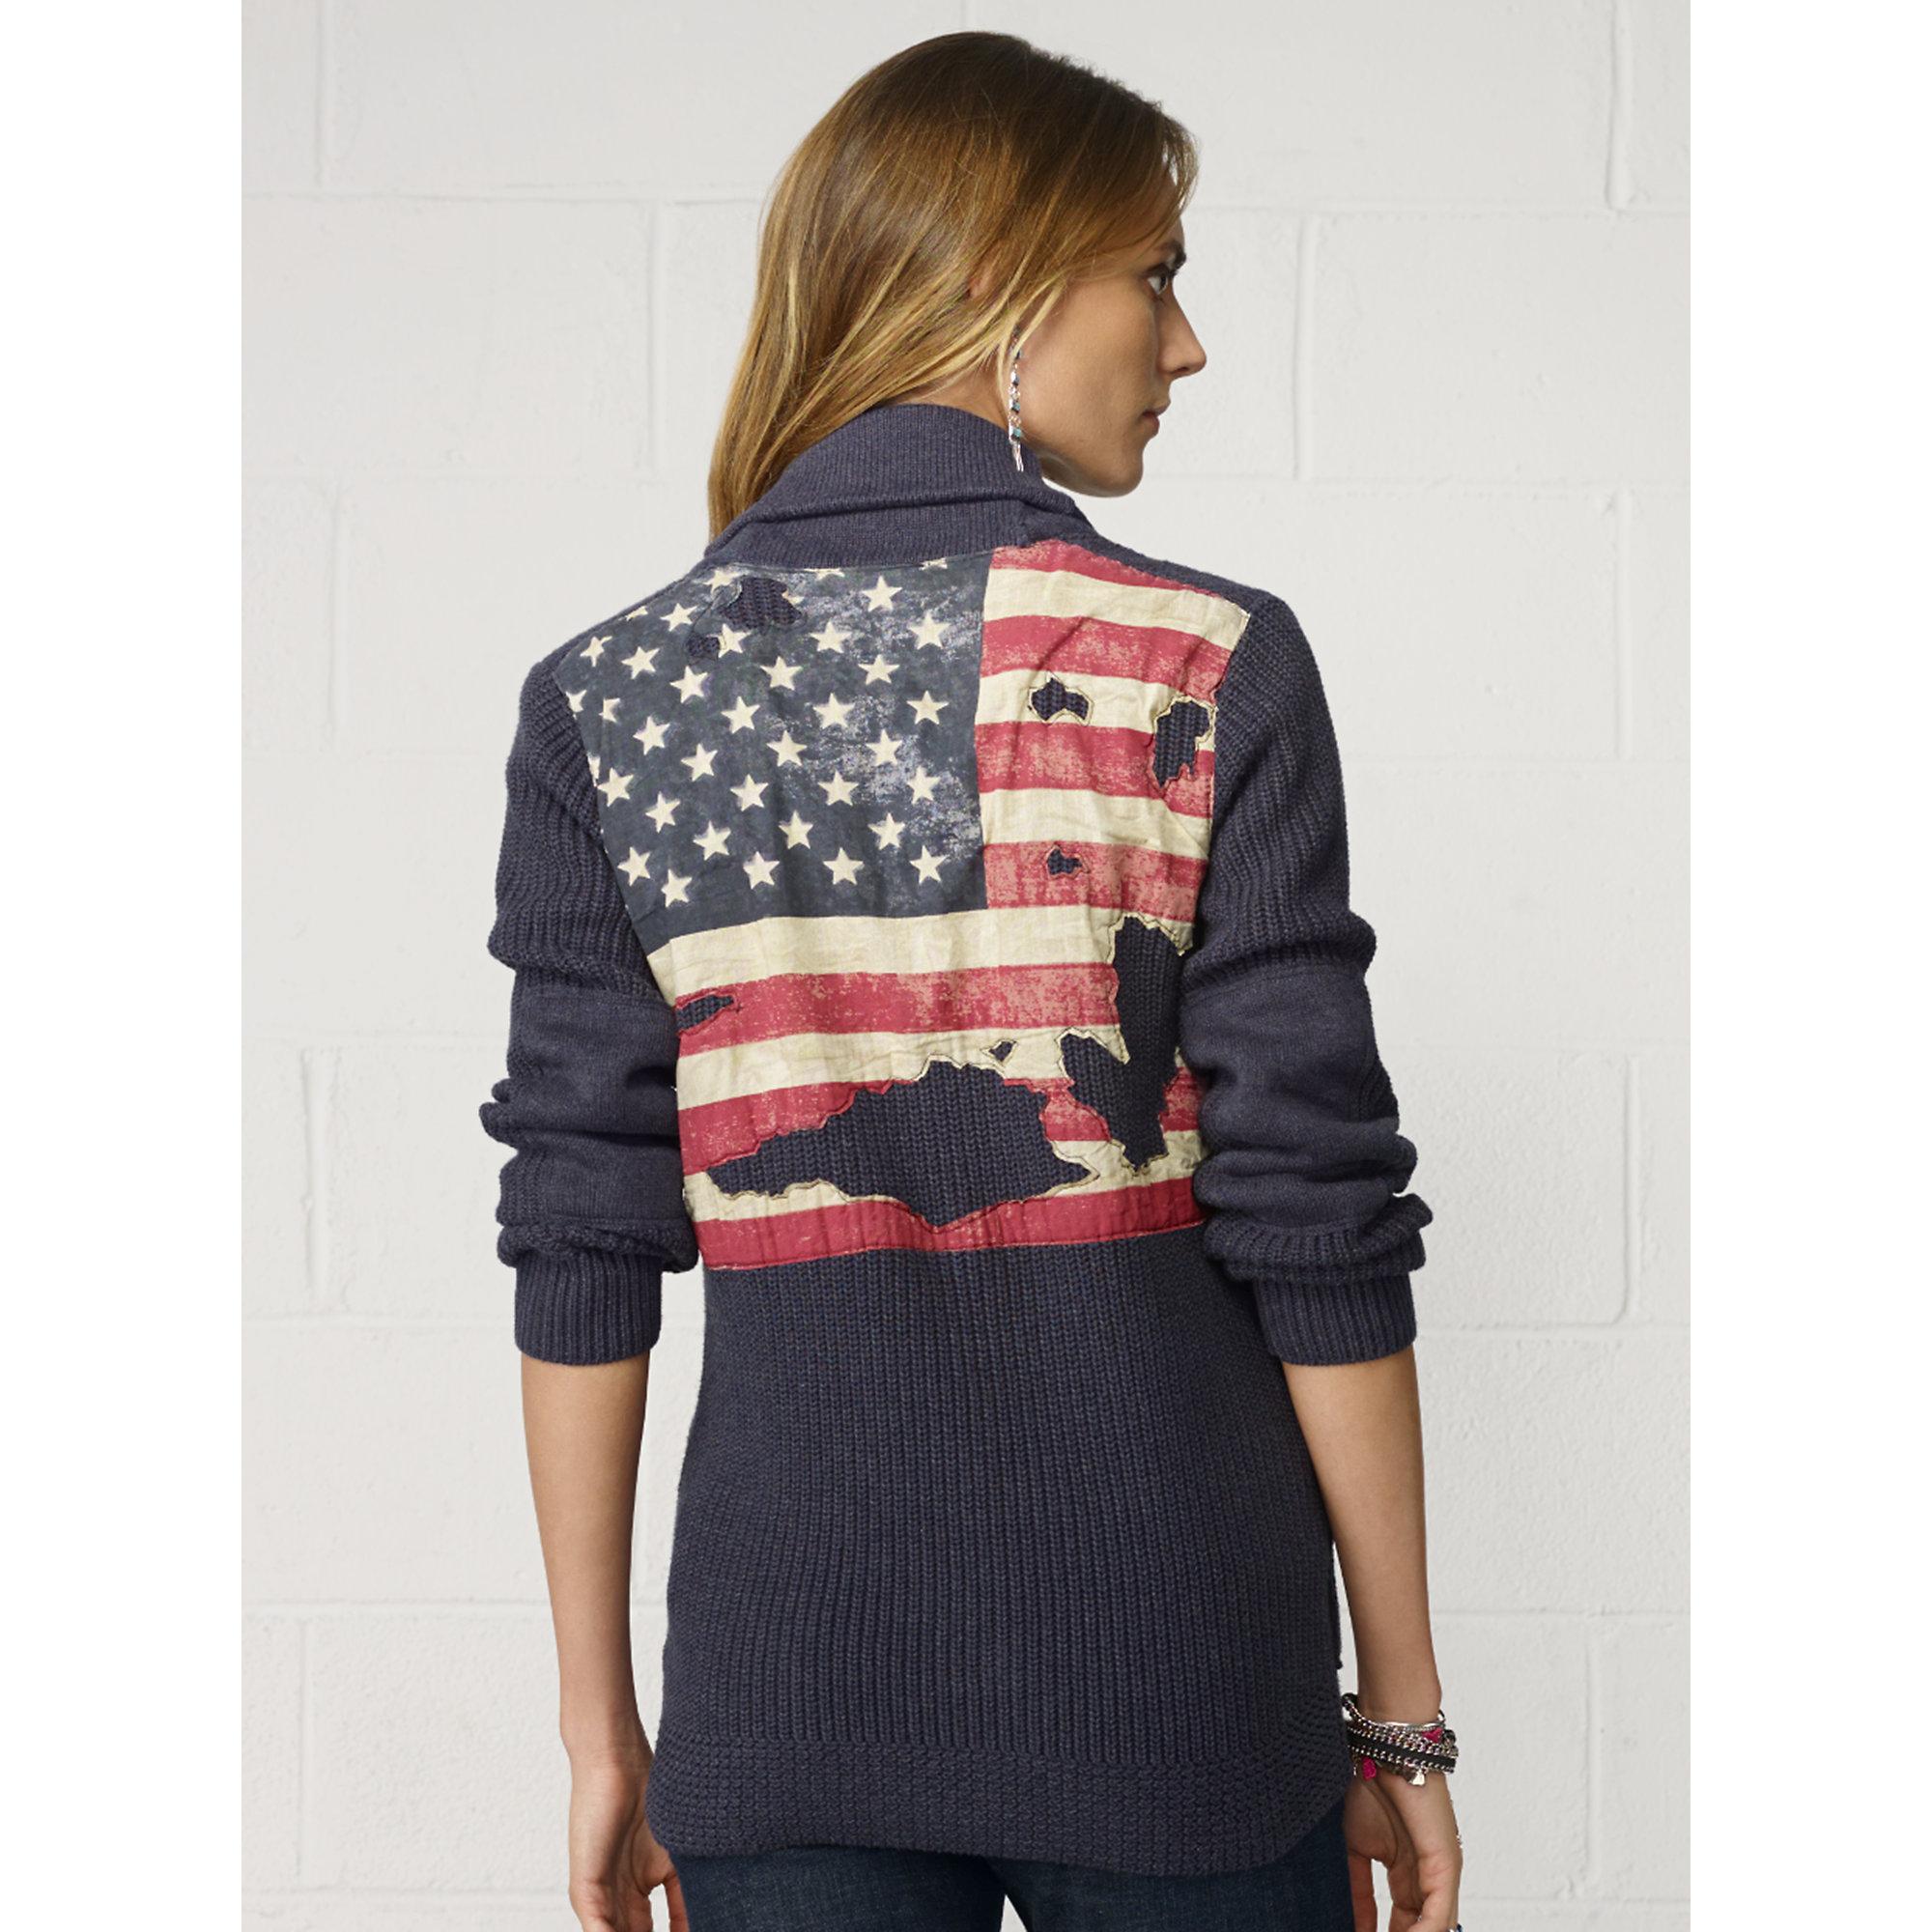 Ralph Lauren American Flag Shawl Sweater 68